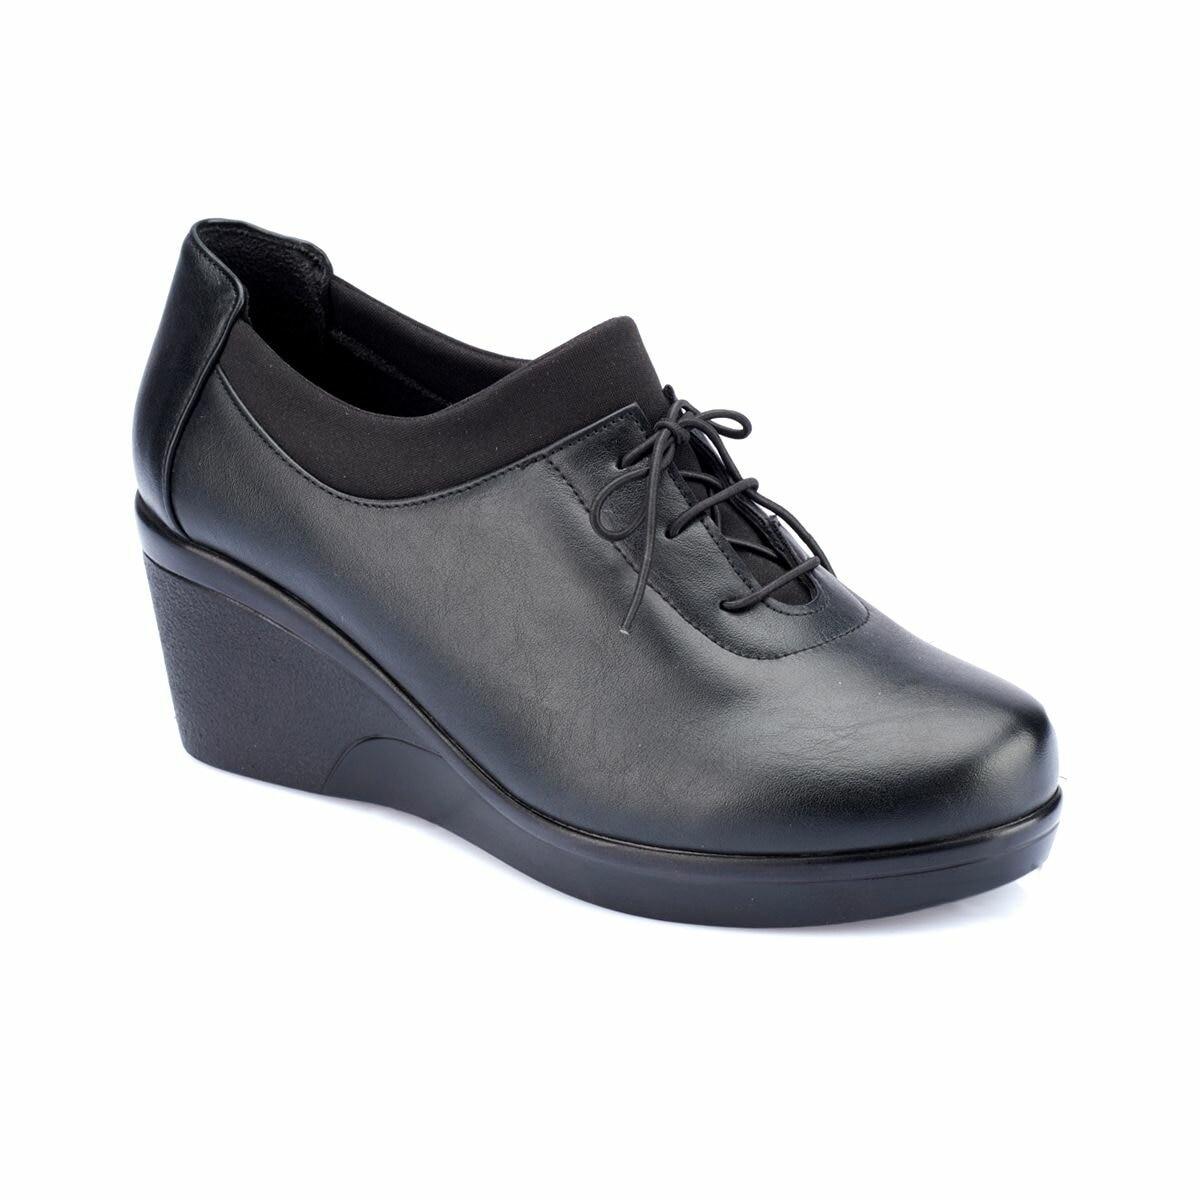 FLO 82.150004.Z Black Women Shoes Polaris